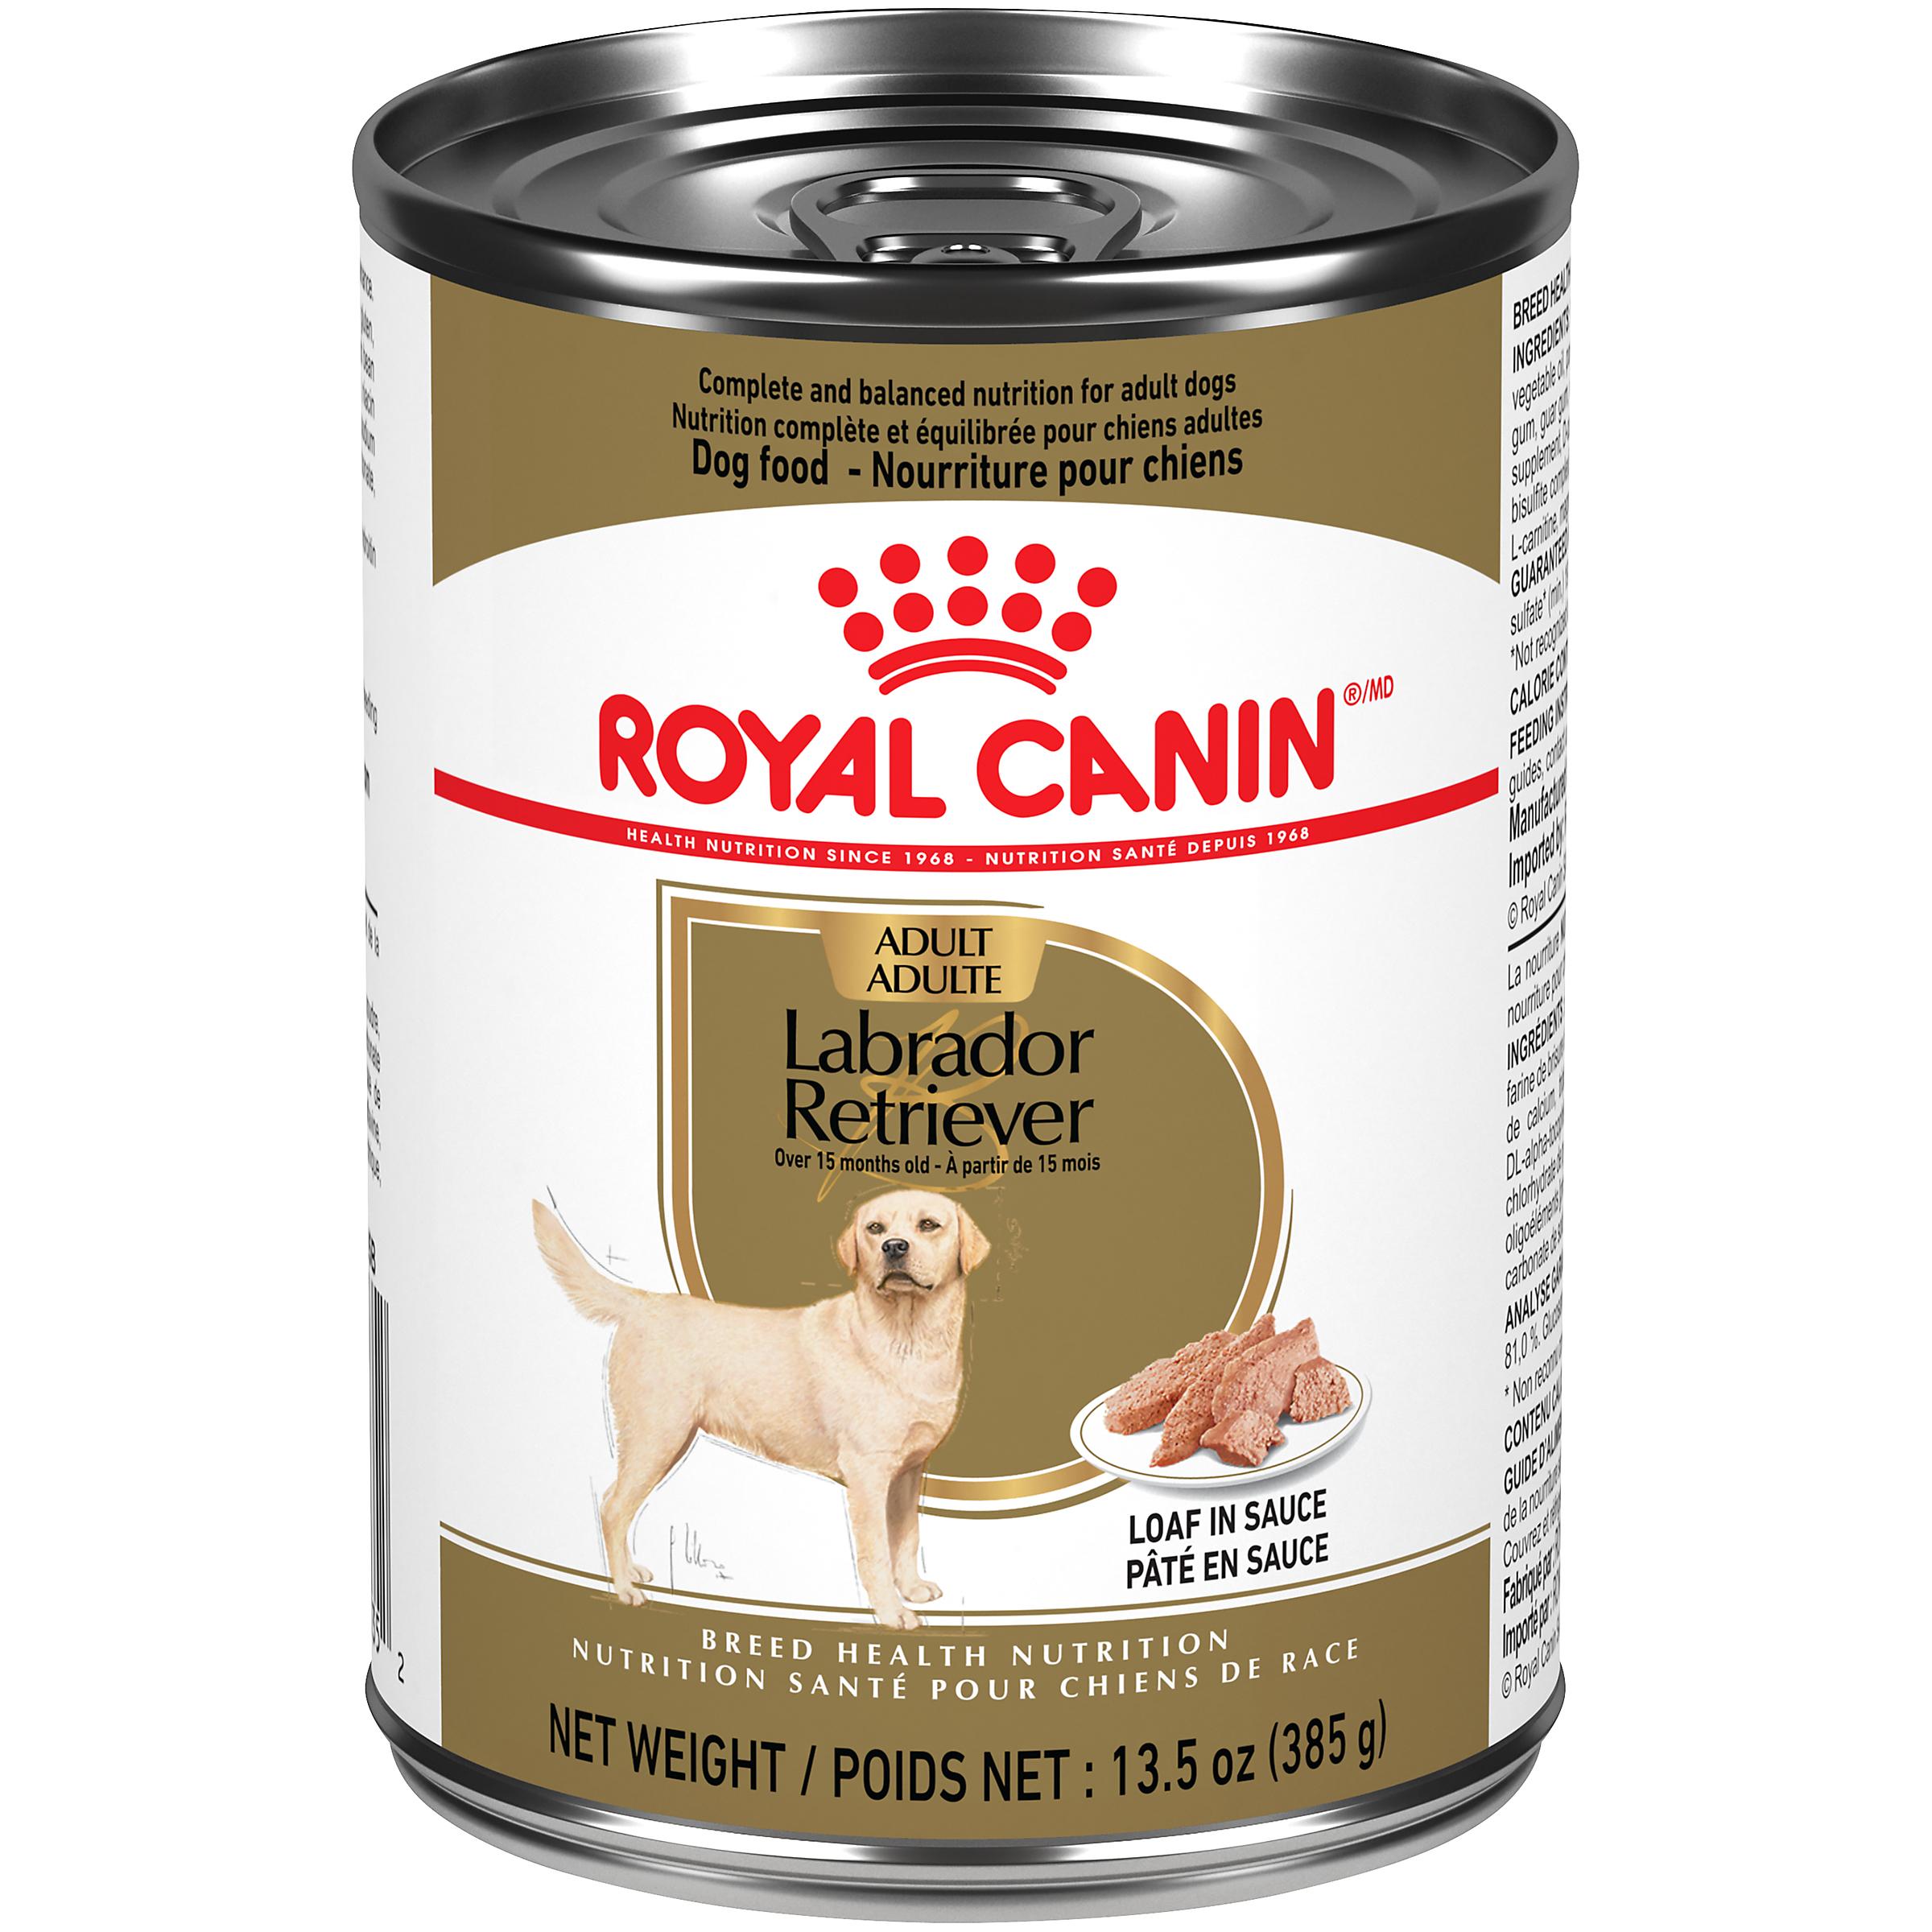 Royal Canin Breed Health Nutrition Labrador Retriever Loaf In Sauce Dog Food